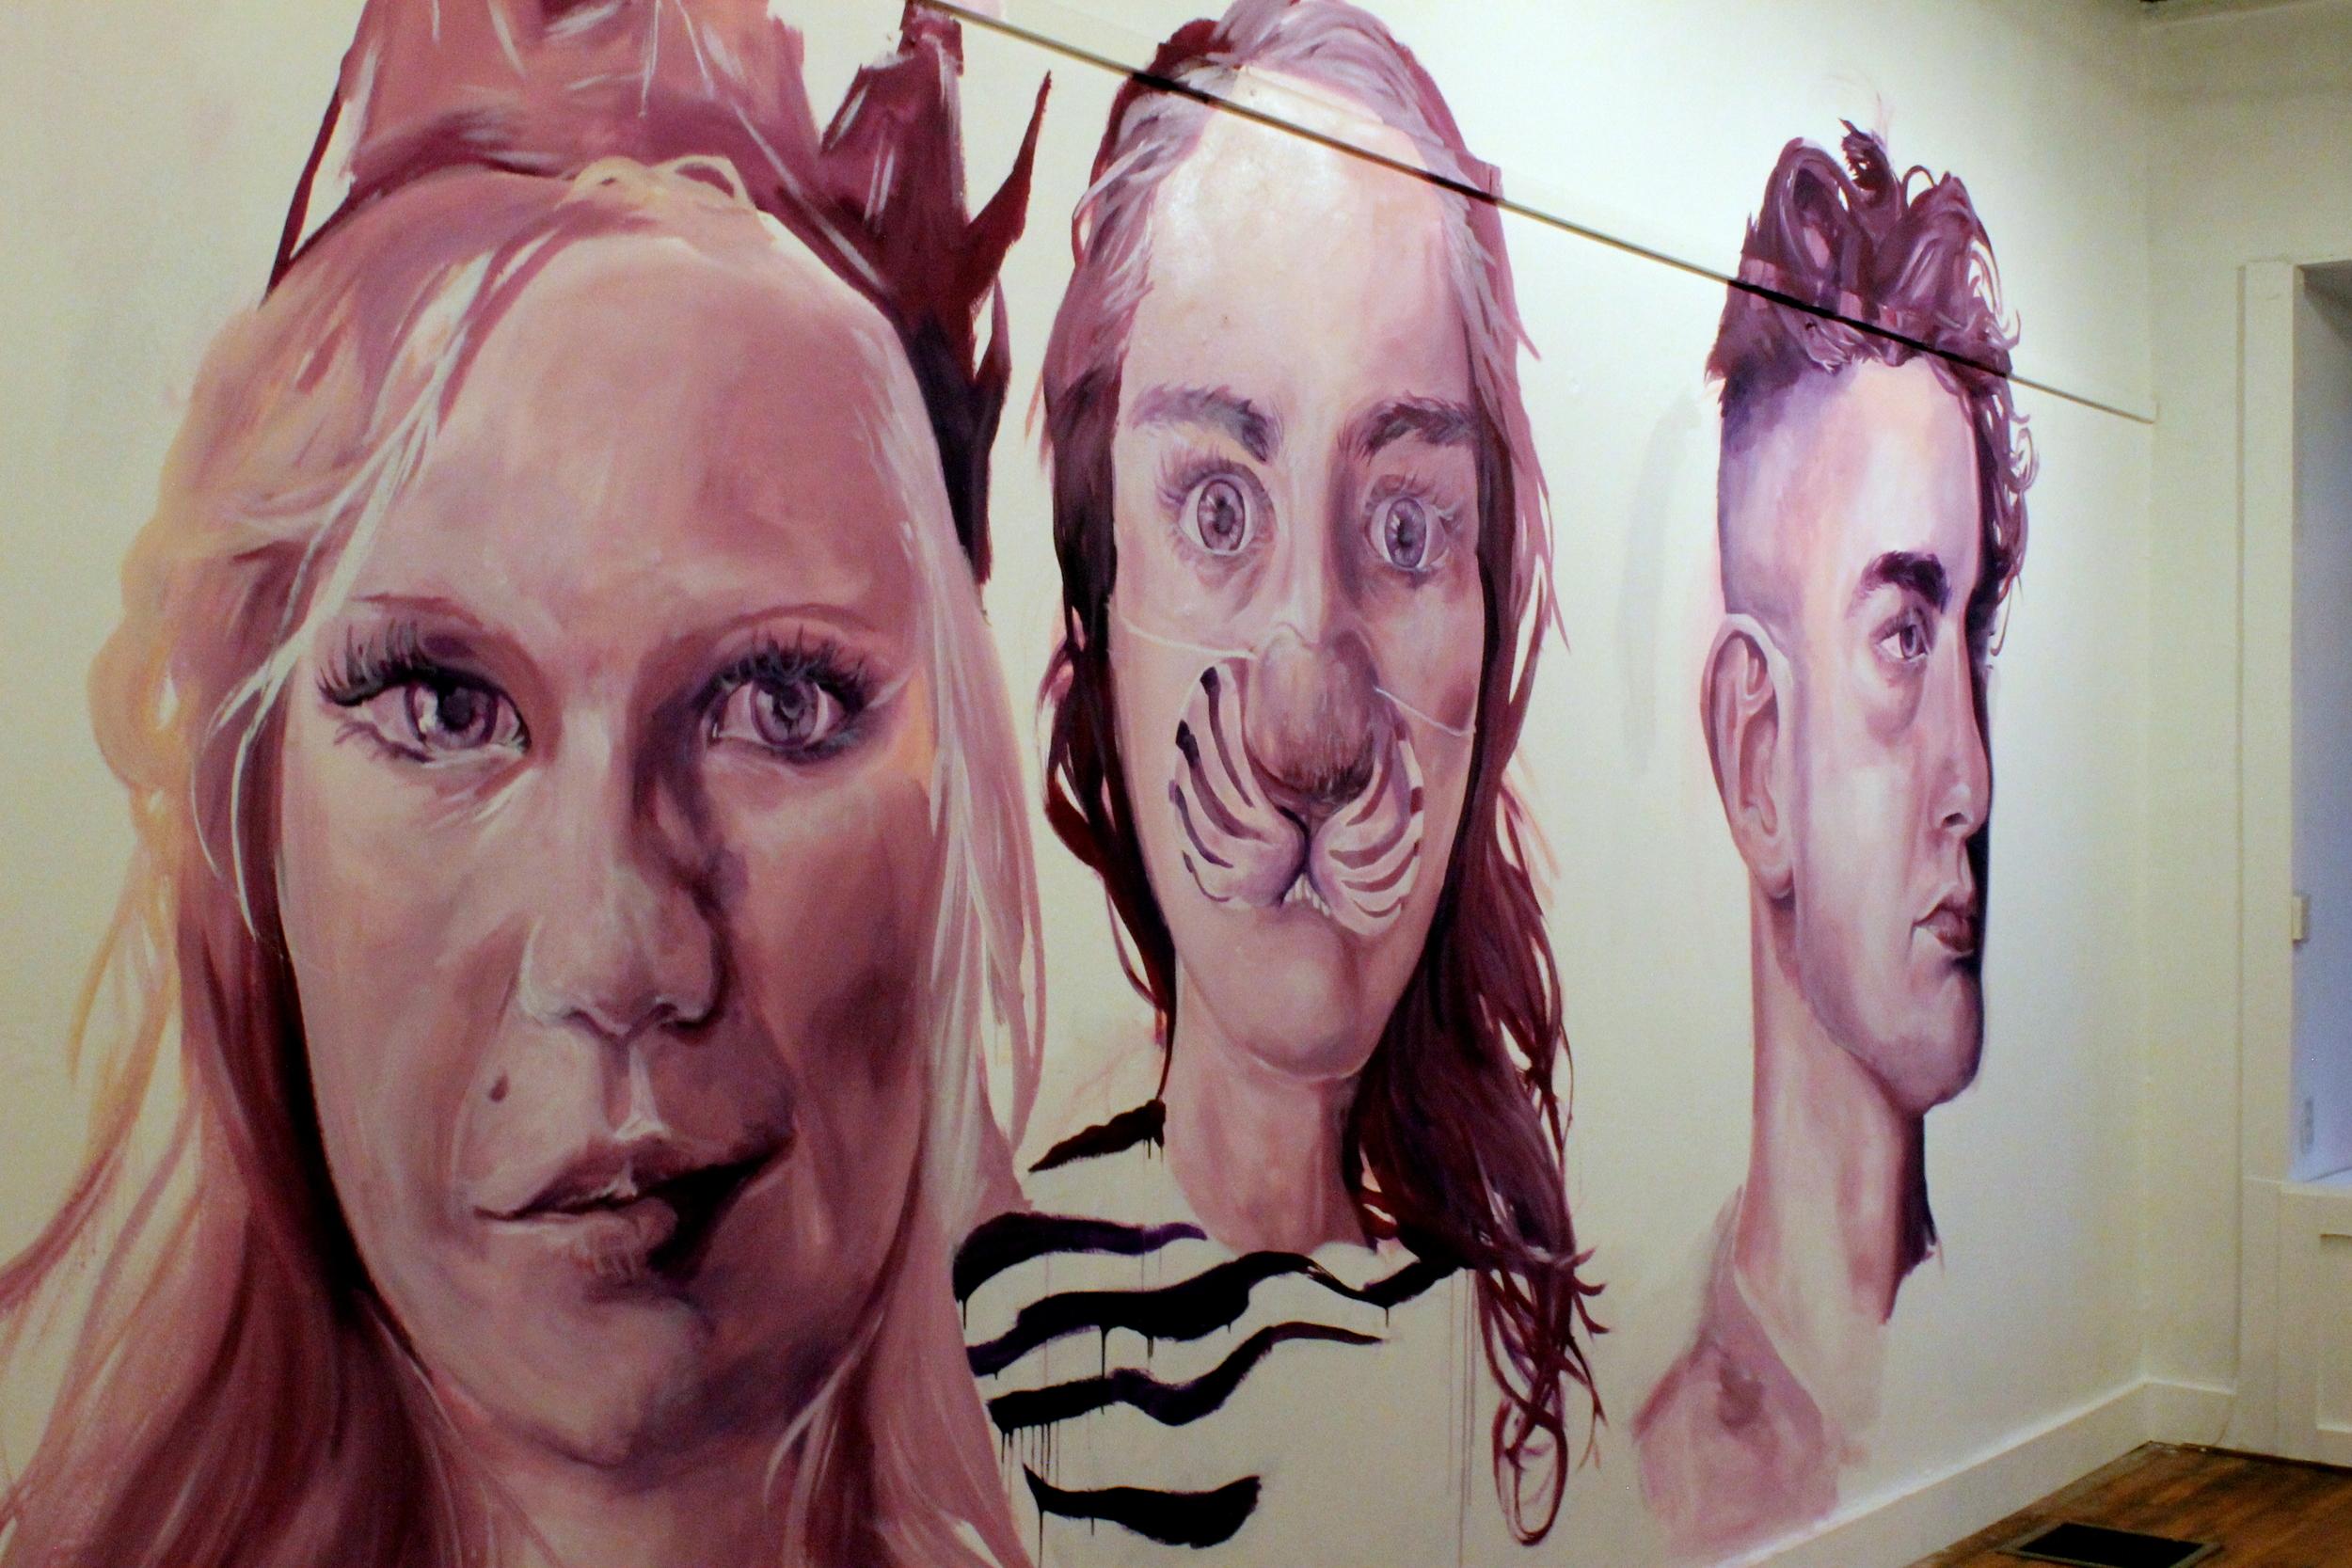 Wall of paintings at VIBRANT